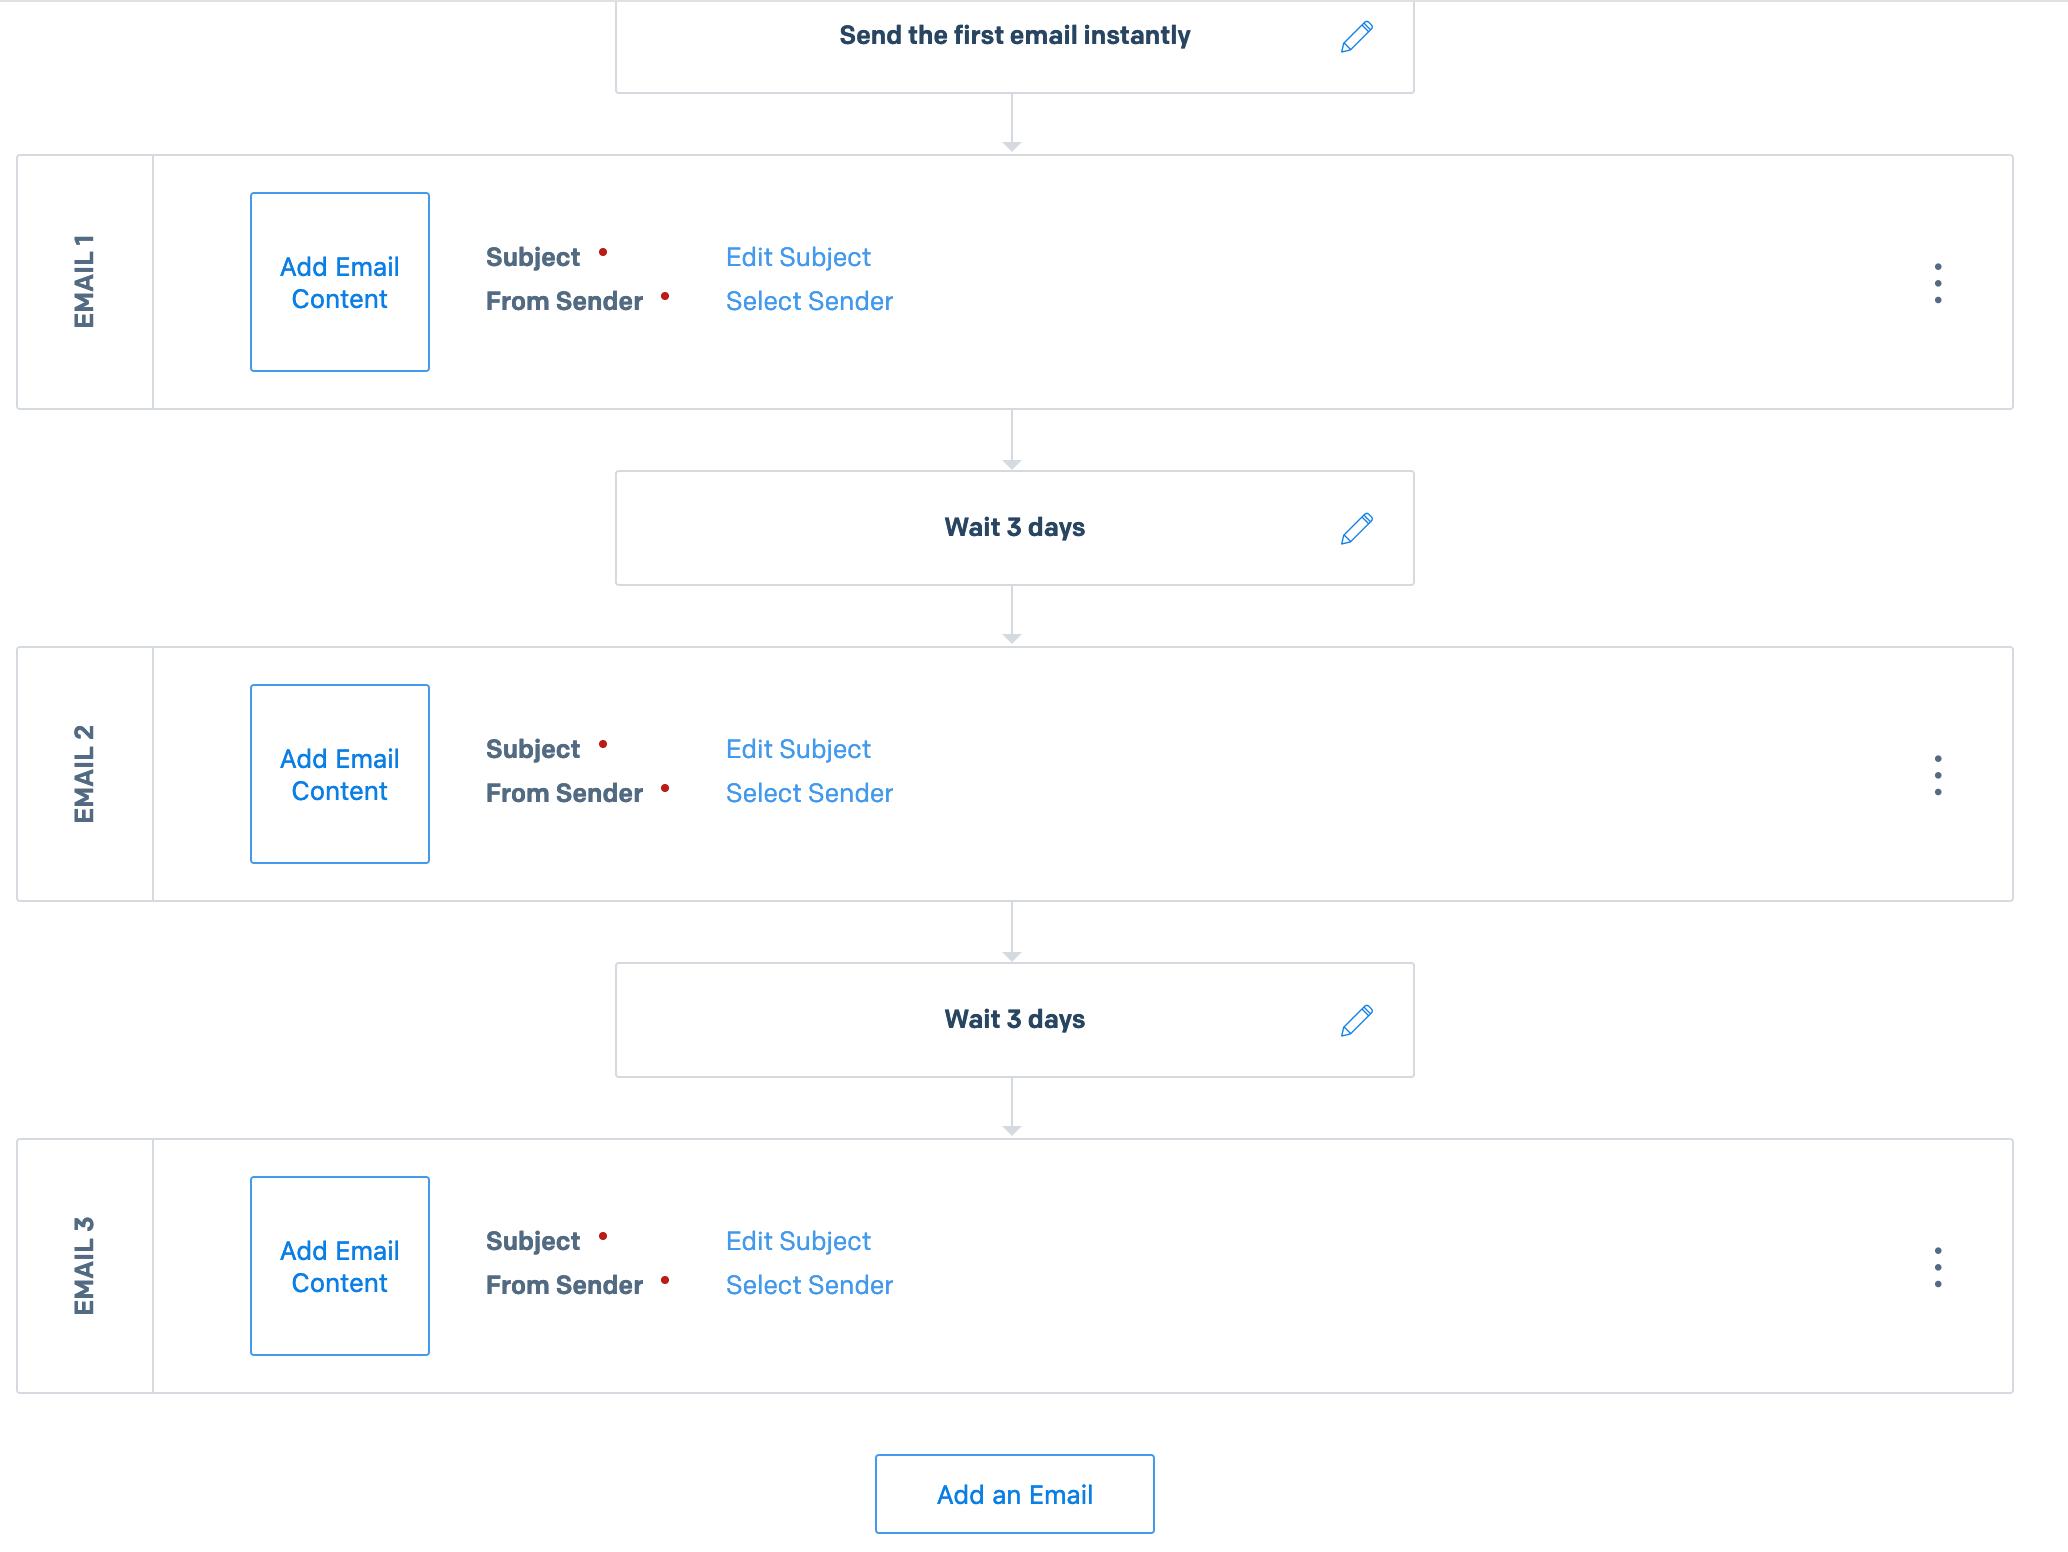 сценарий автоматизации в Sendgrid